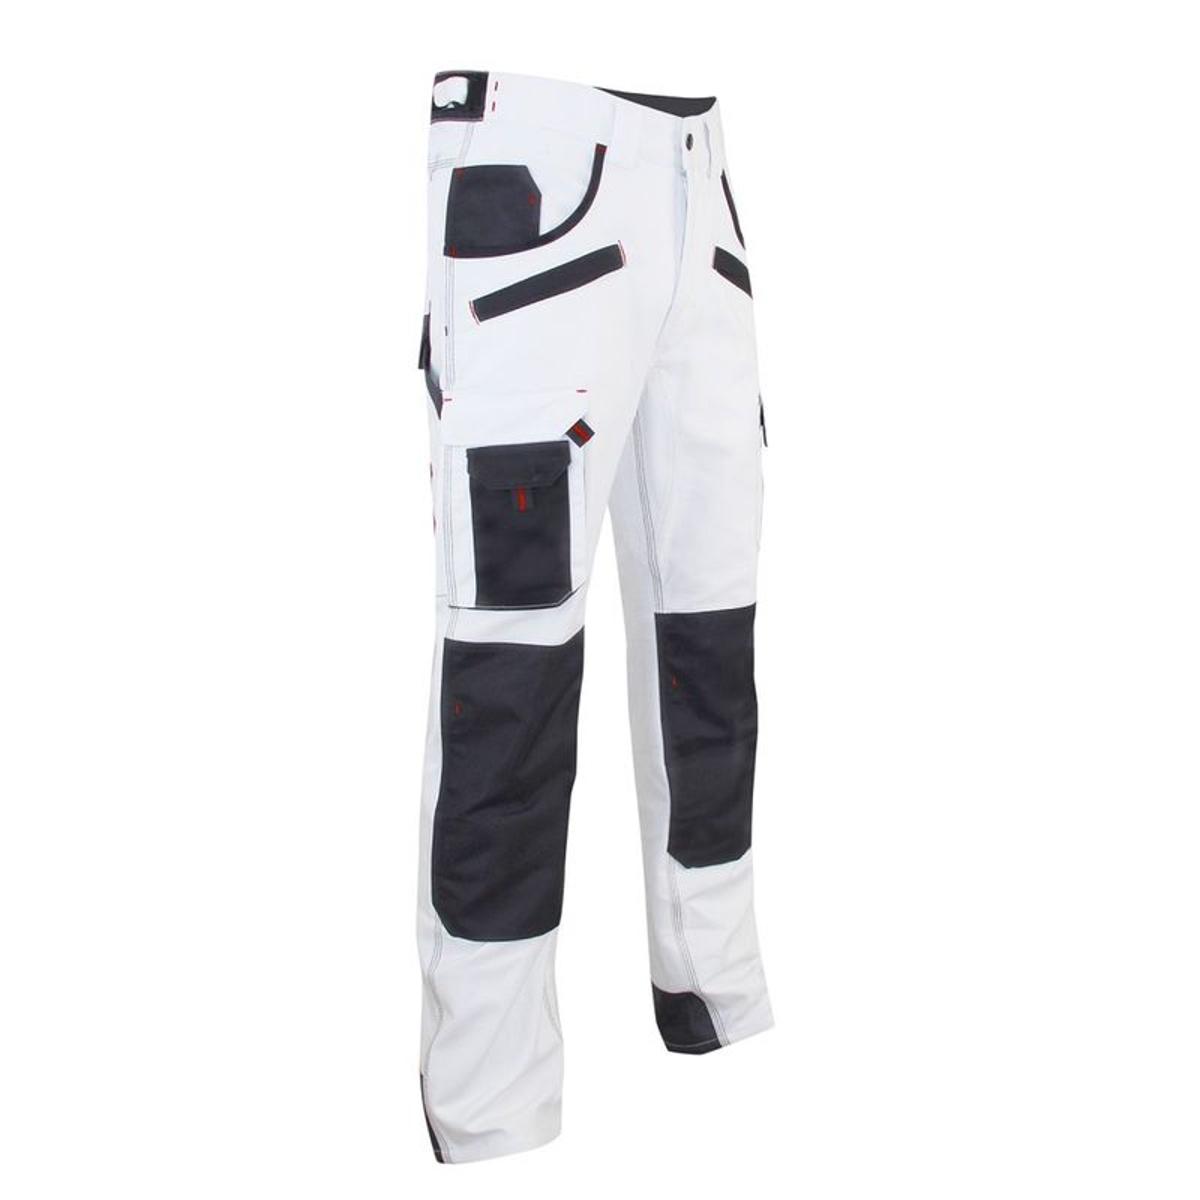 Pantalon de peintre à genouillères AEROSOL